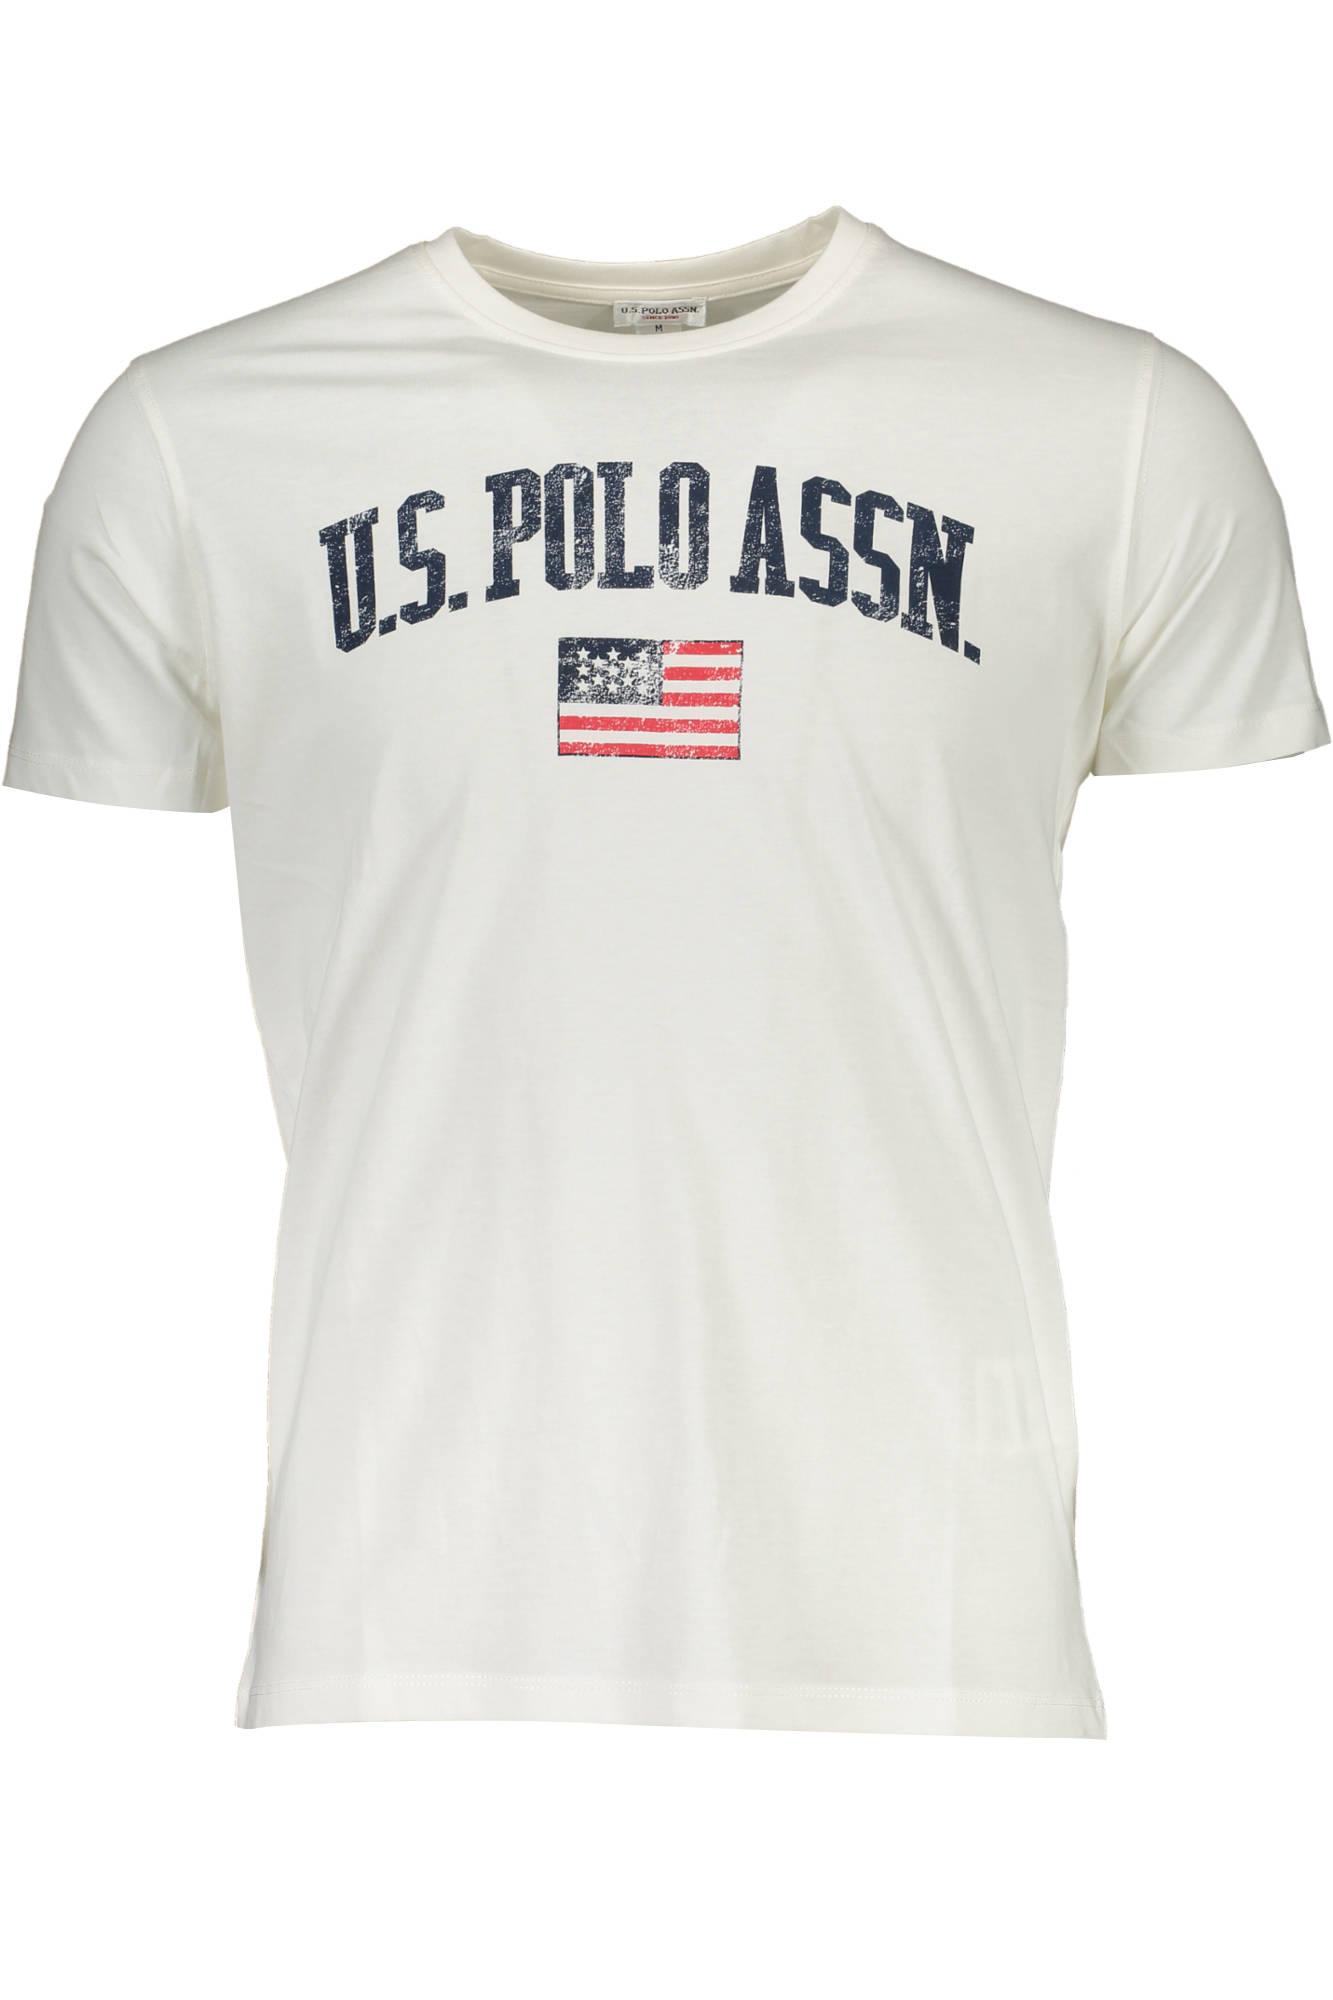 Tričko U.S. POLO tričko s krátkým rukávem BIANCO